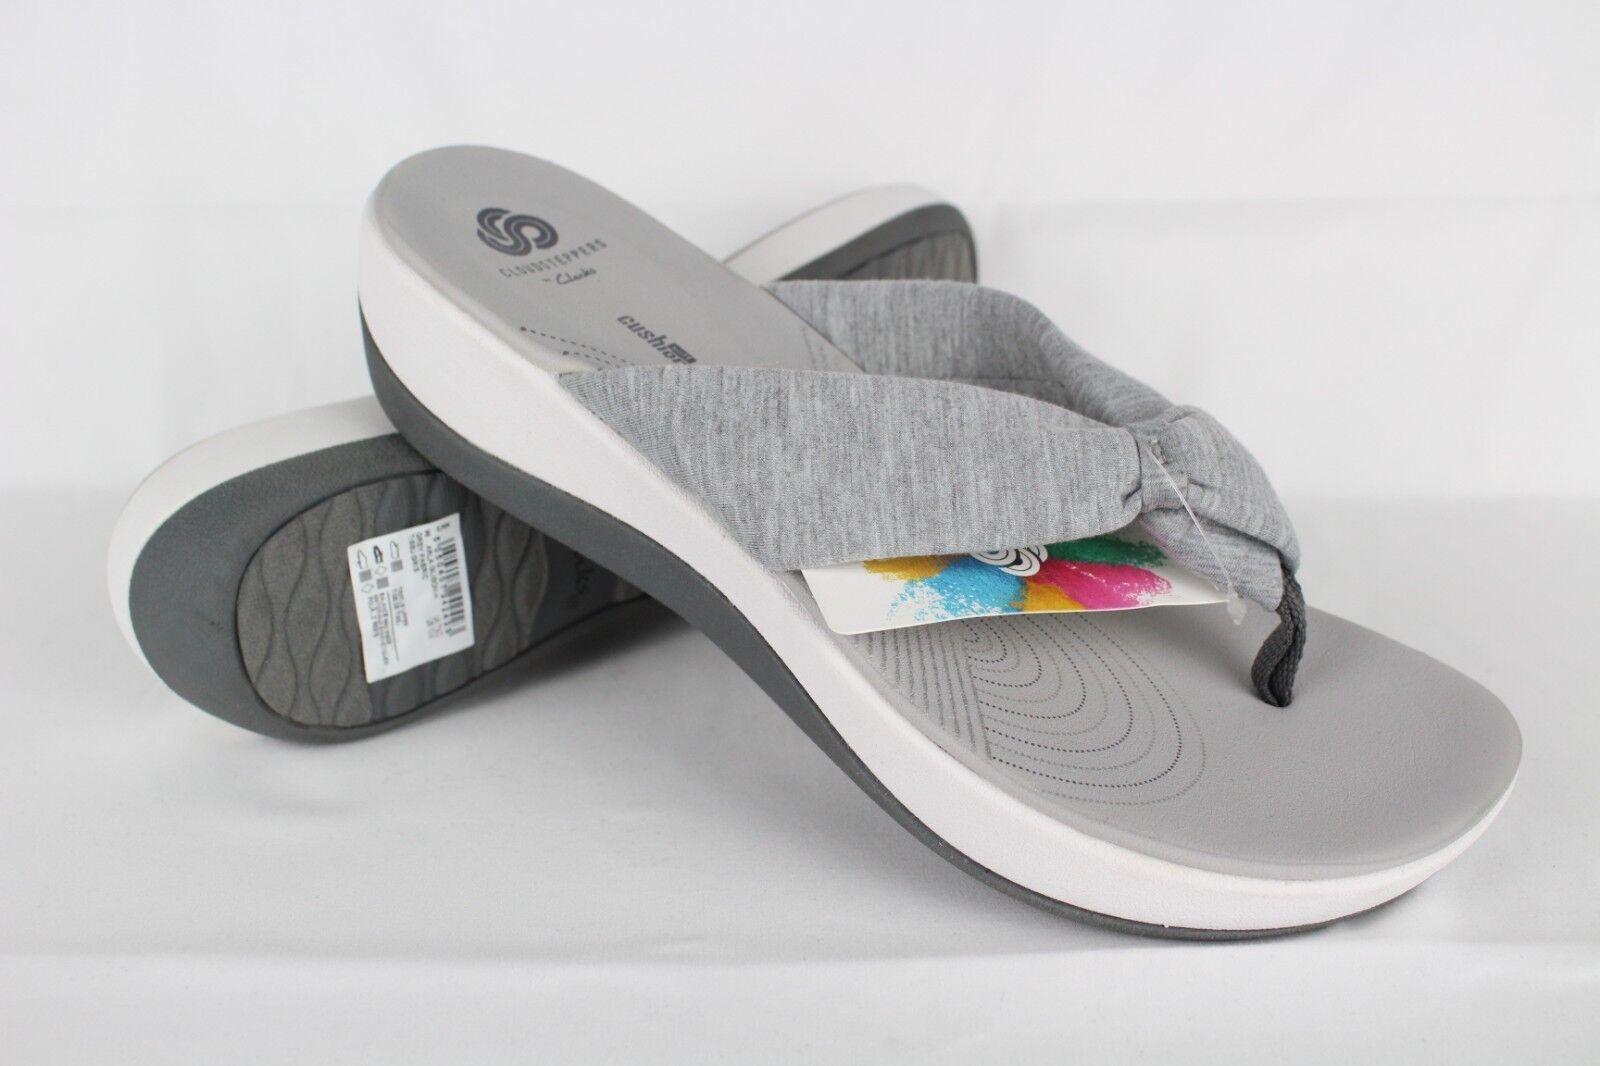 New Clarks Women's Arla Glison Slide Sandals Size 10m Grey 26126195